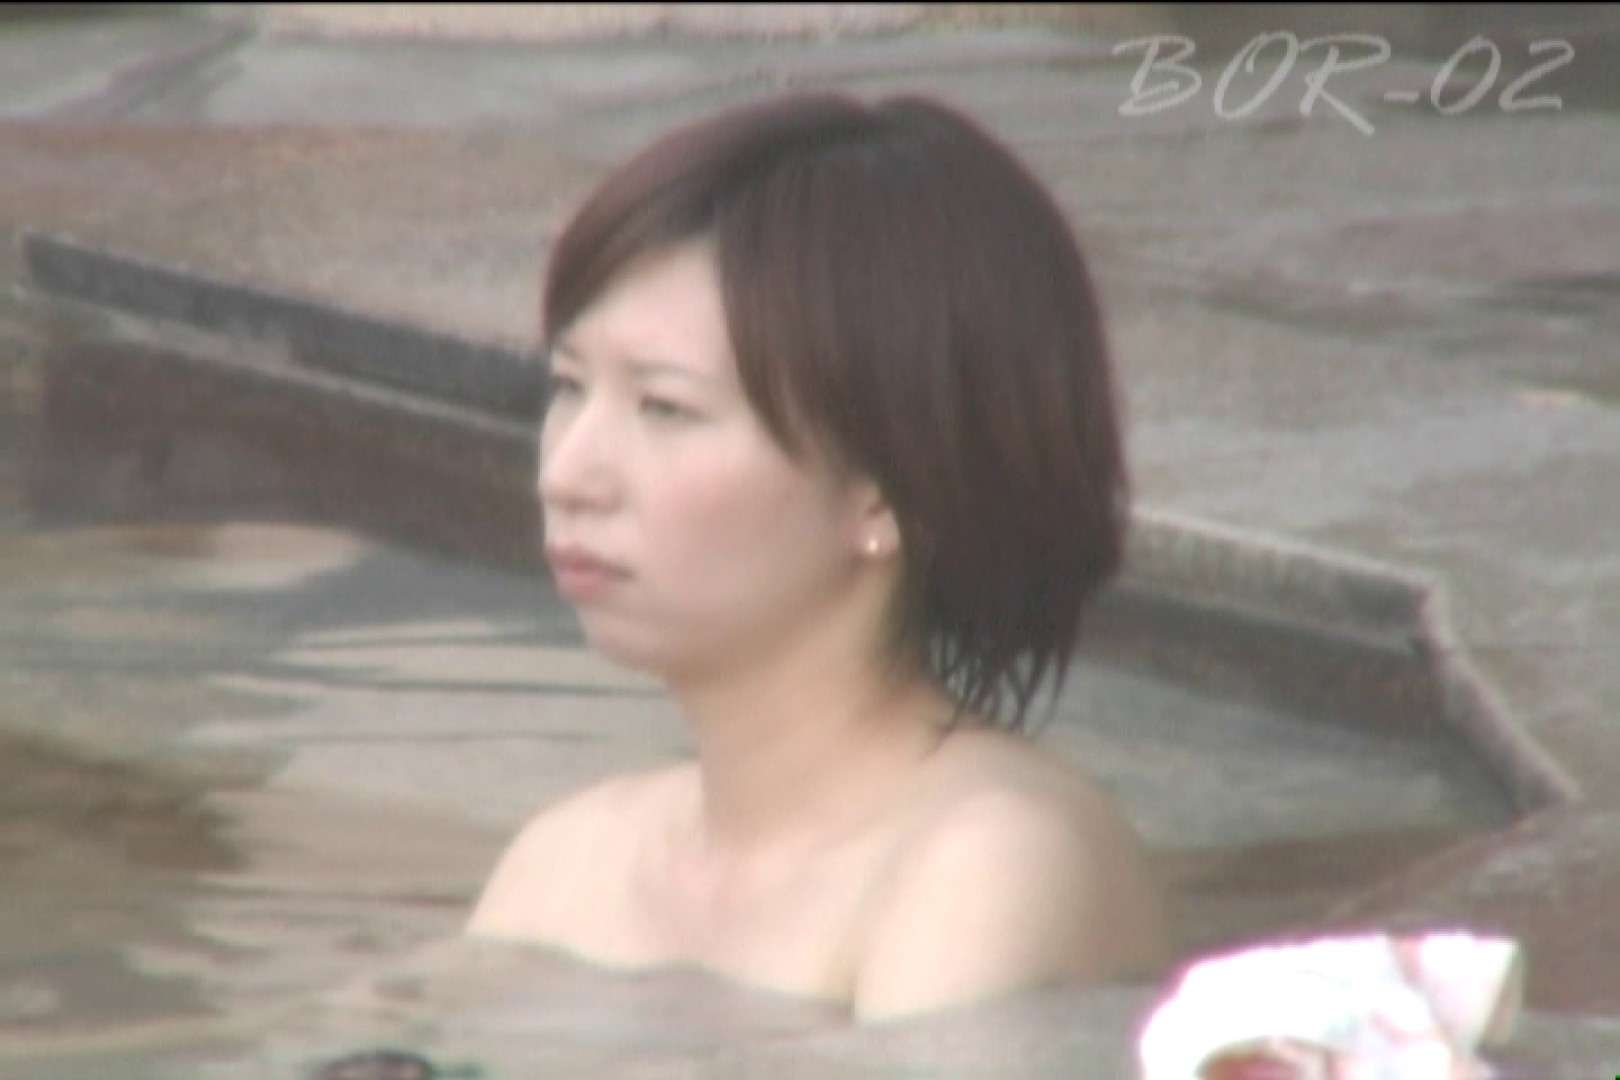 Aquaな露天風呂Vol.475 露天 | OLセックス  96画像 19